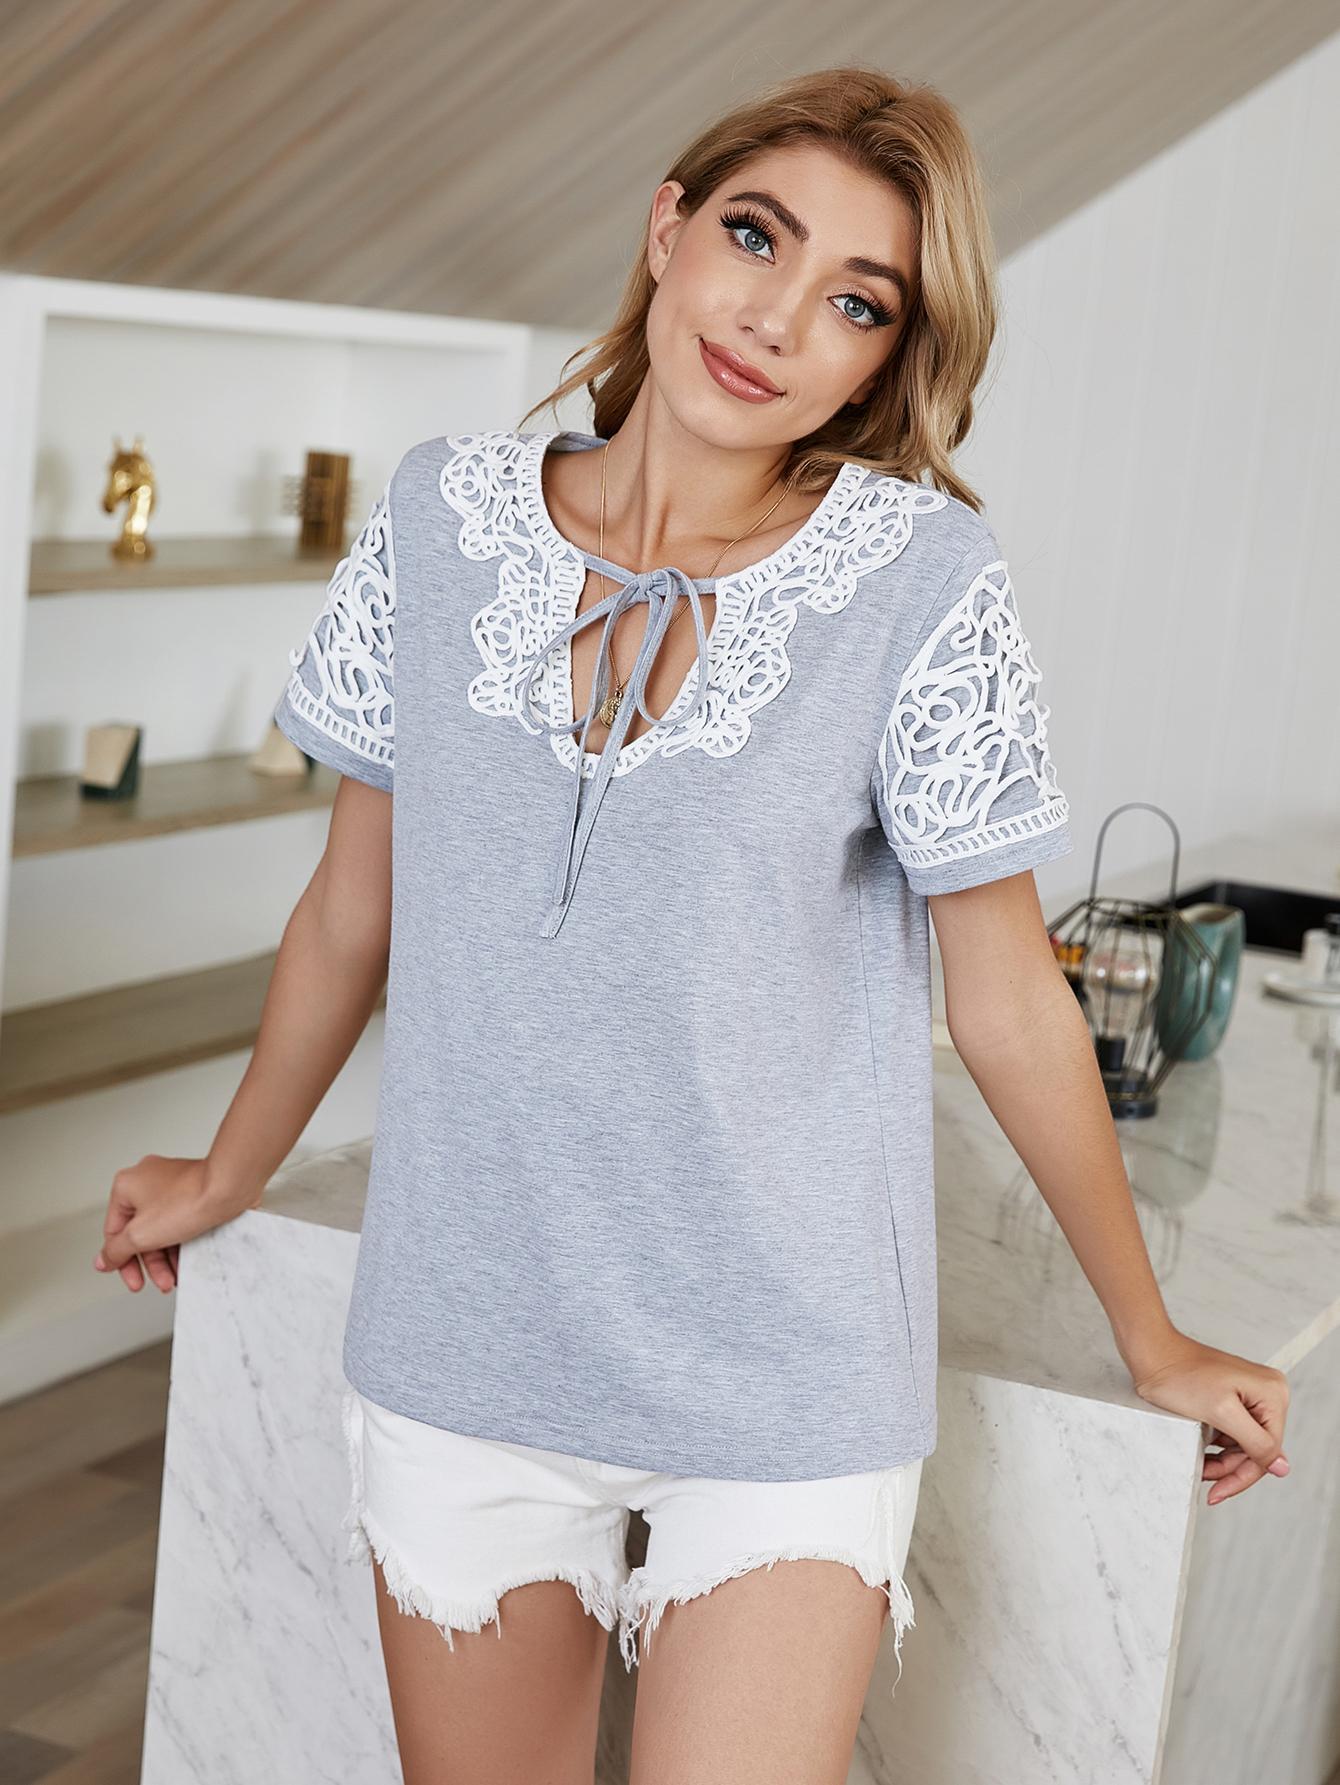 Sommerfrauen Spitze Nähen Niedliche T-Shirt Mode V-Ausschnitt Hohl Grau Für Teen Mädchen Tops T-Stück Bluse Kurzarm Damenhemd